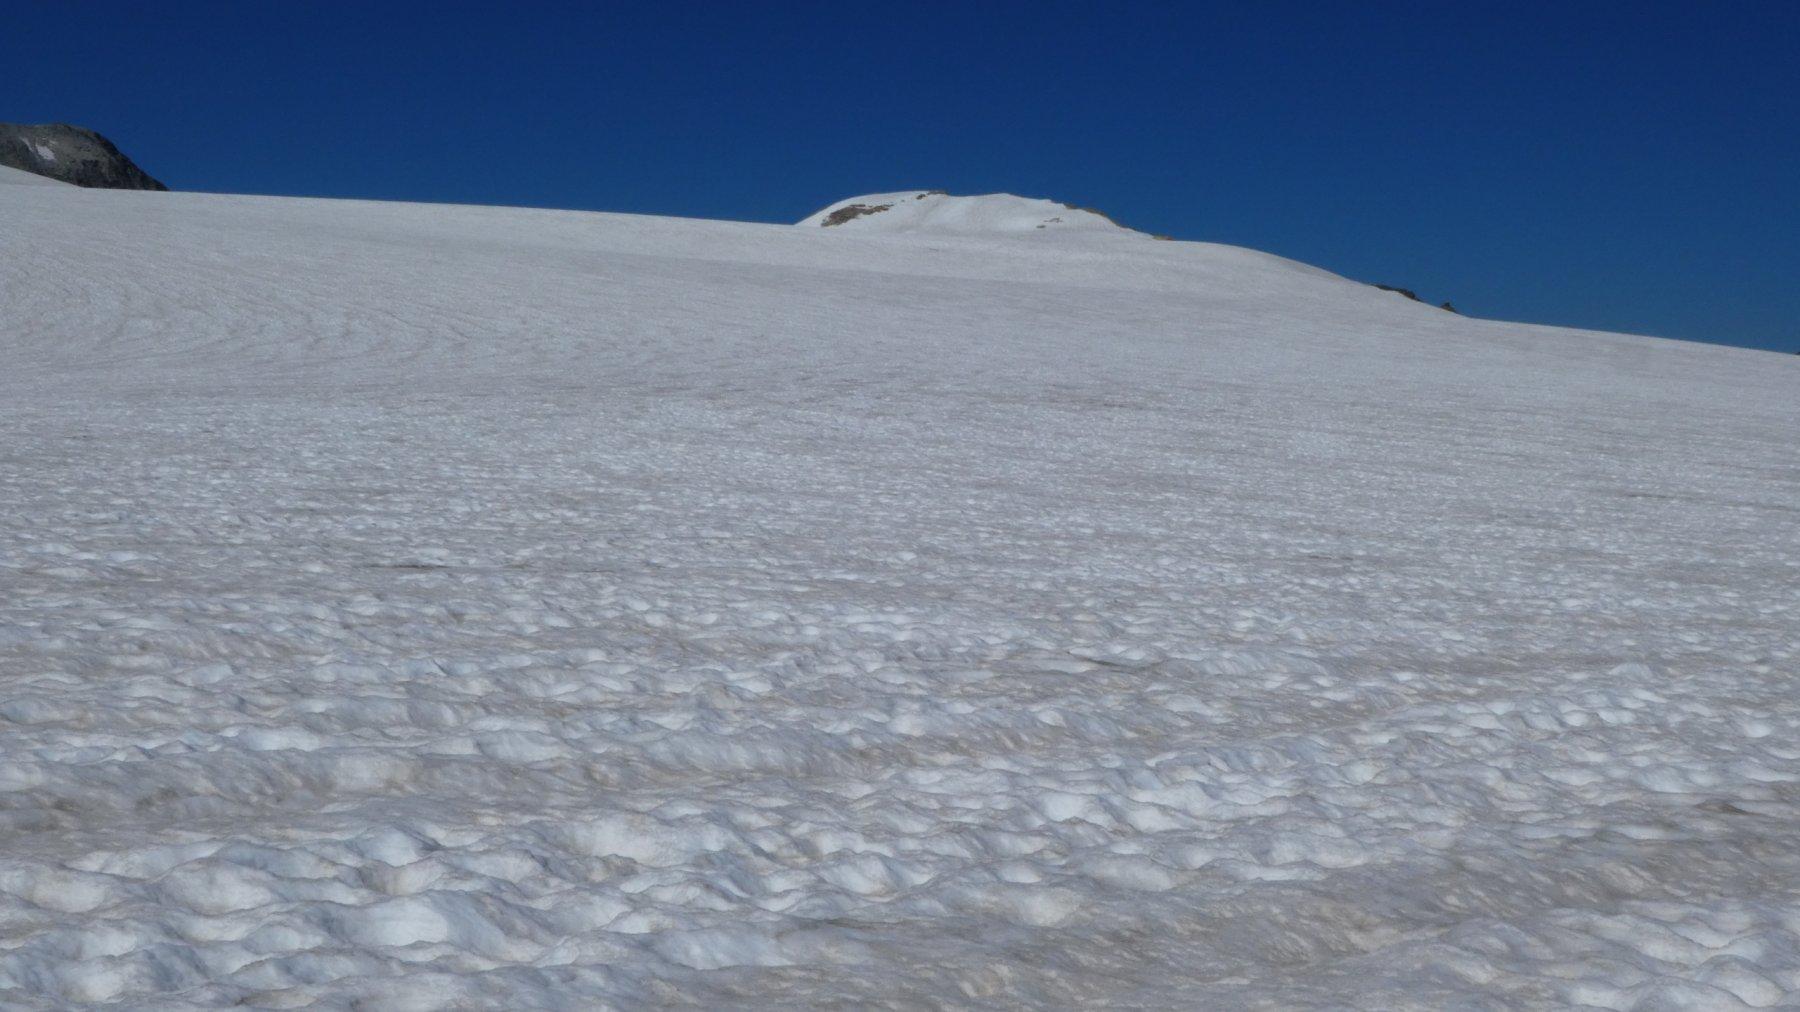 il vastissimo ghiacciaio da risalire (desert blanc)